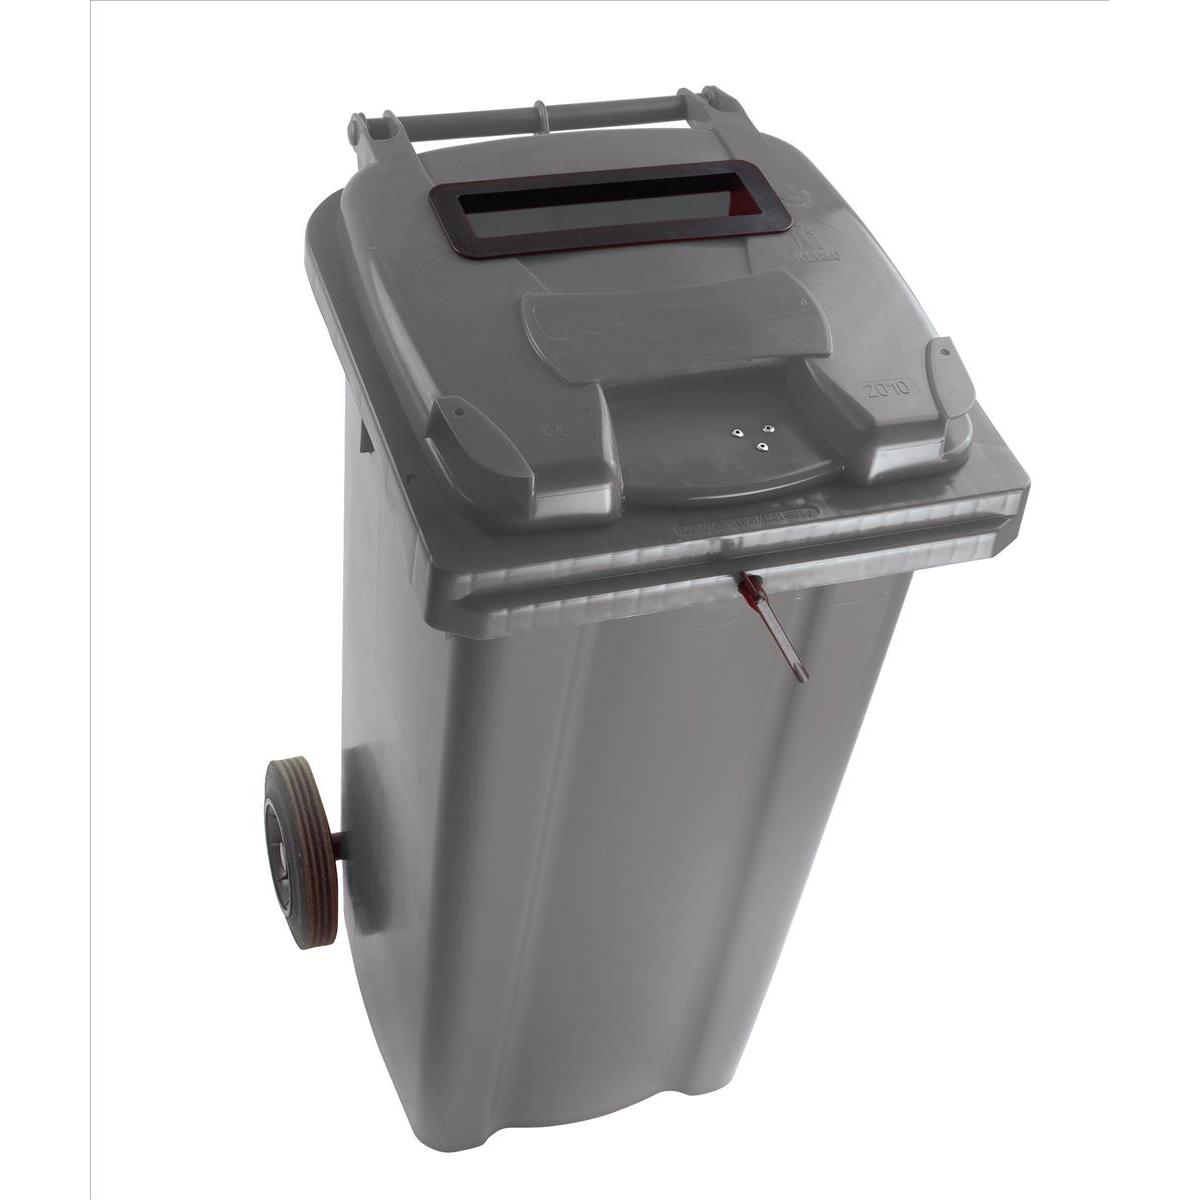 Wheeled Bin UV Stabilised Polyethylene with Rear Wheels Lid Lock 140 Litre Capacity 480x555x1070mm Grey